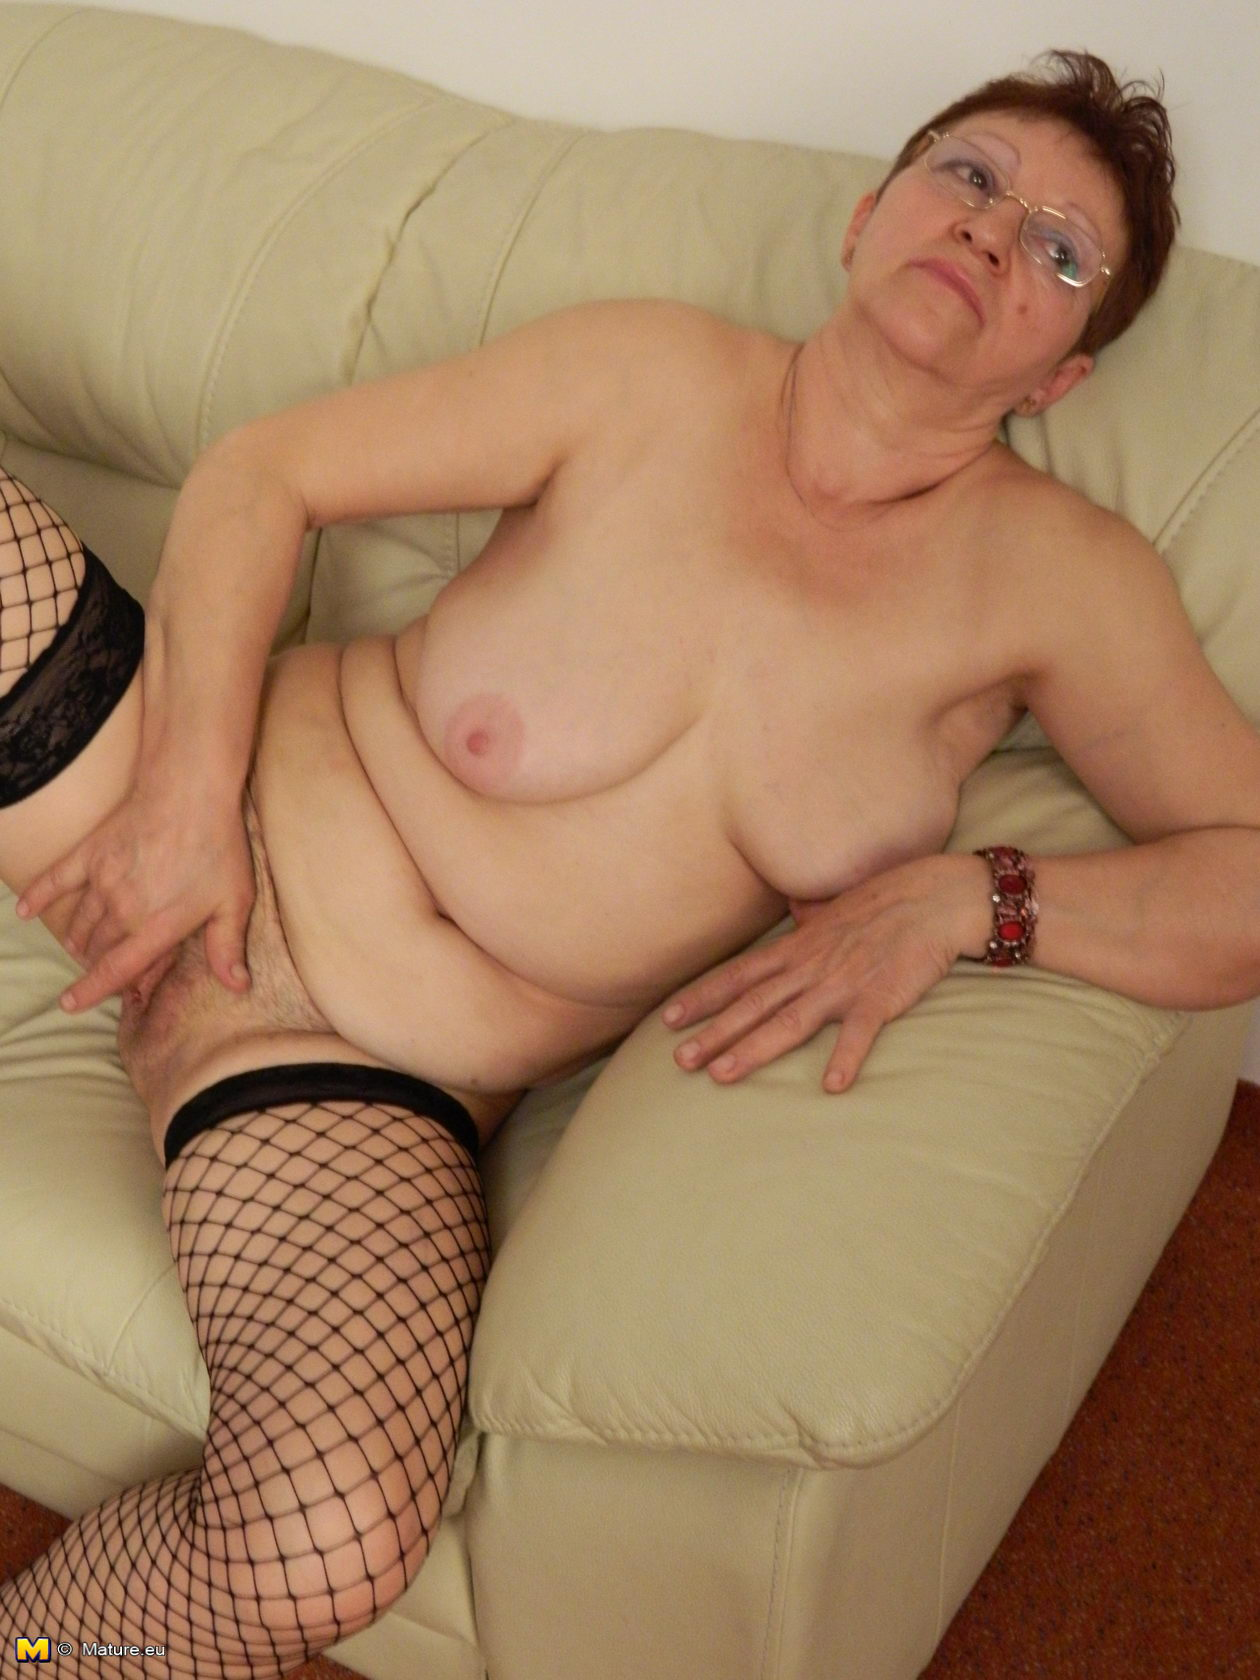 [censored] leg old slut